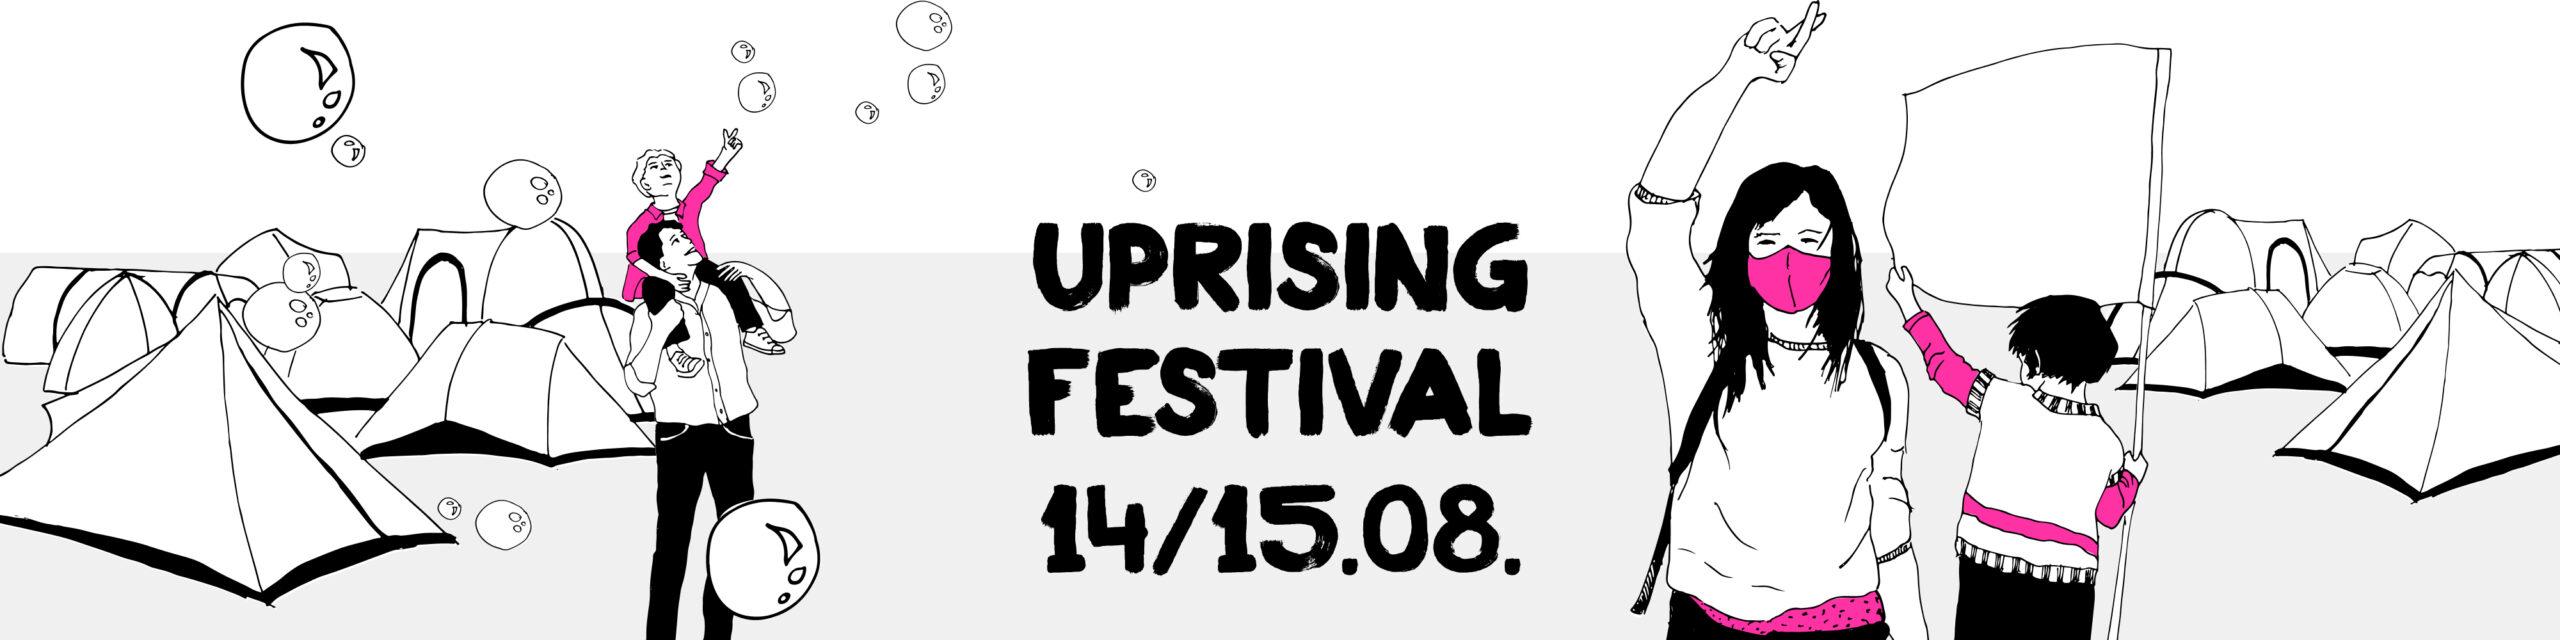 uprisingfestival-header